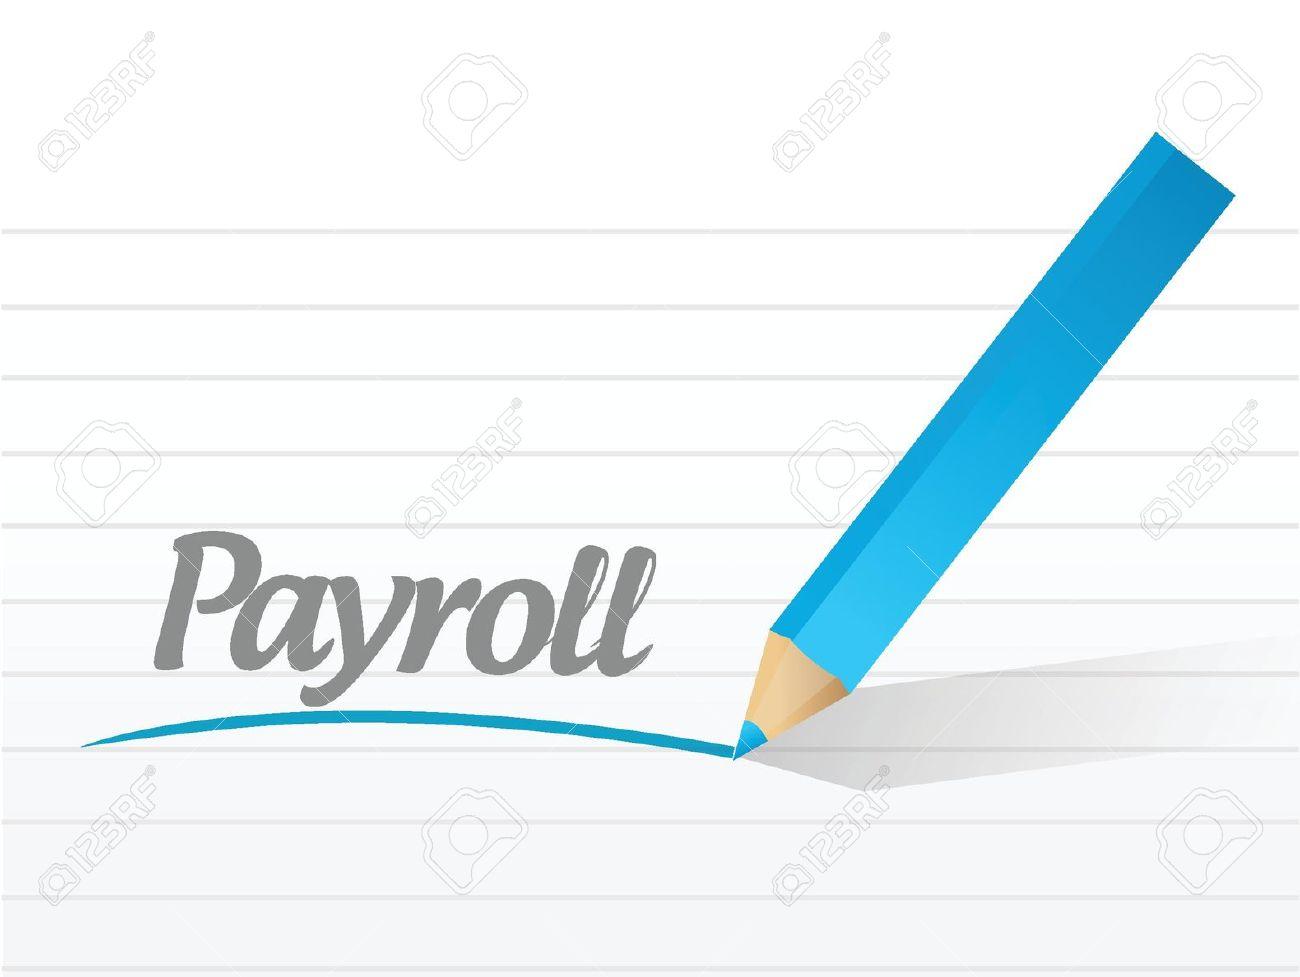 Payroll Clip Art Images | Clipart Panda - Free Clipart Images: www.clipartpanda.com/categories/payroll-clip-art-images